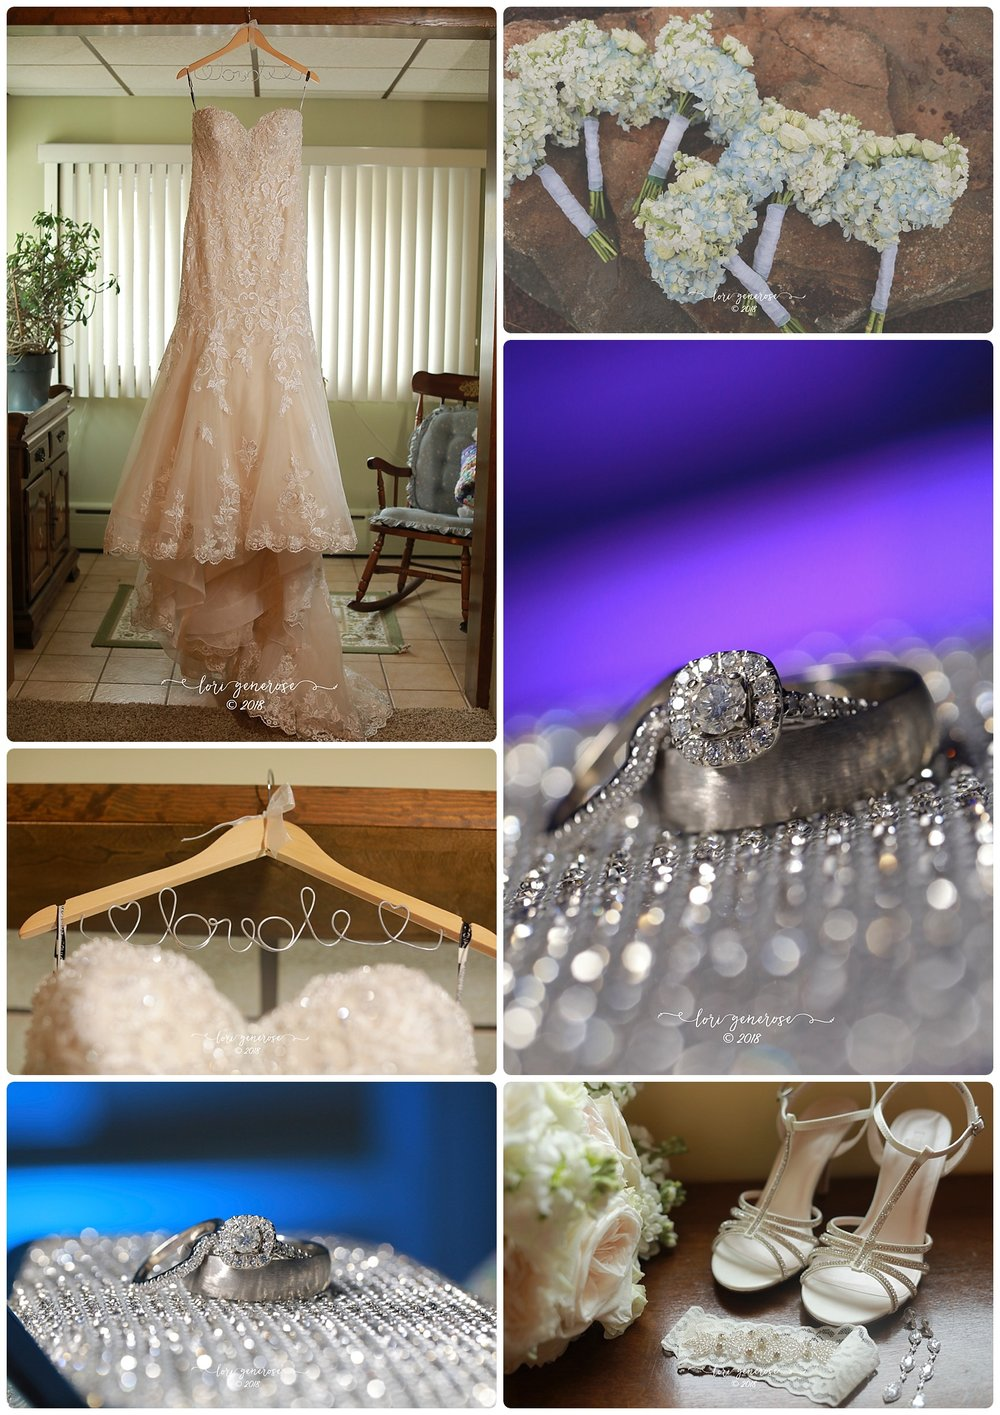 lgphotographylorigeneroseweddingdetailsweddingdressflowersshoesbridaljewelyweddingrings.jpg